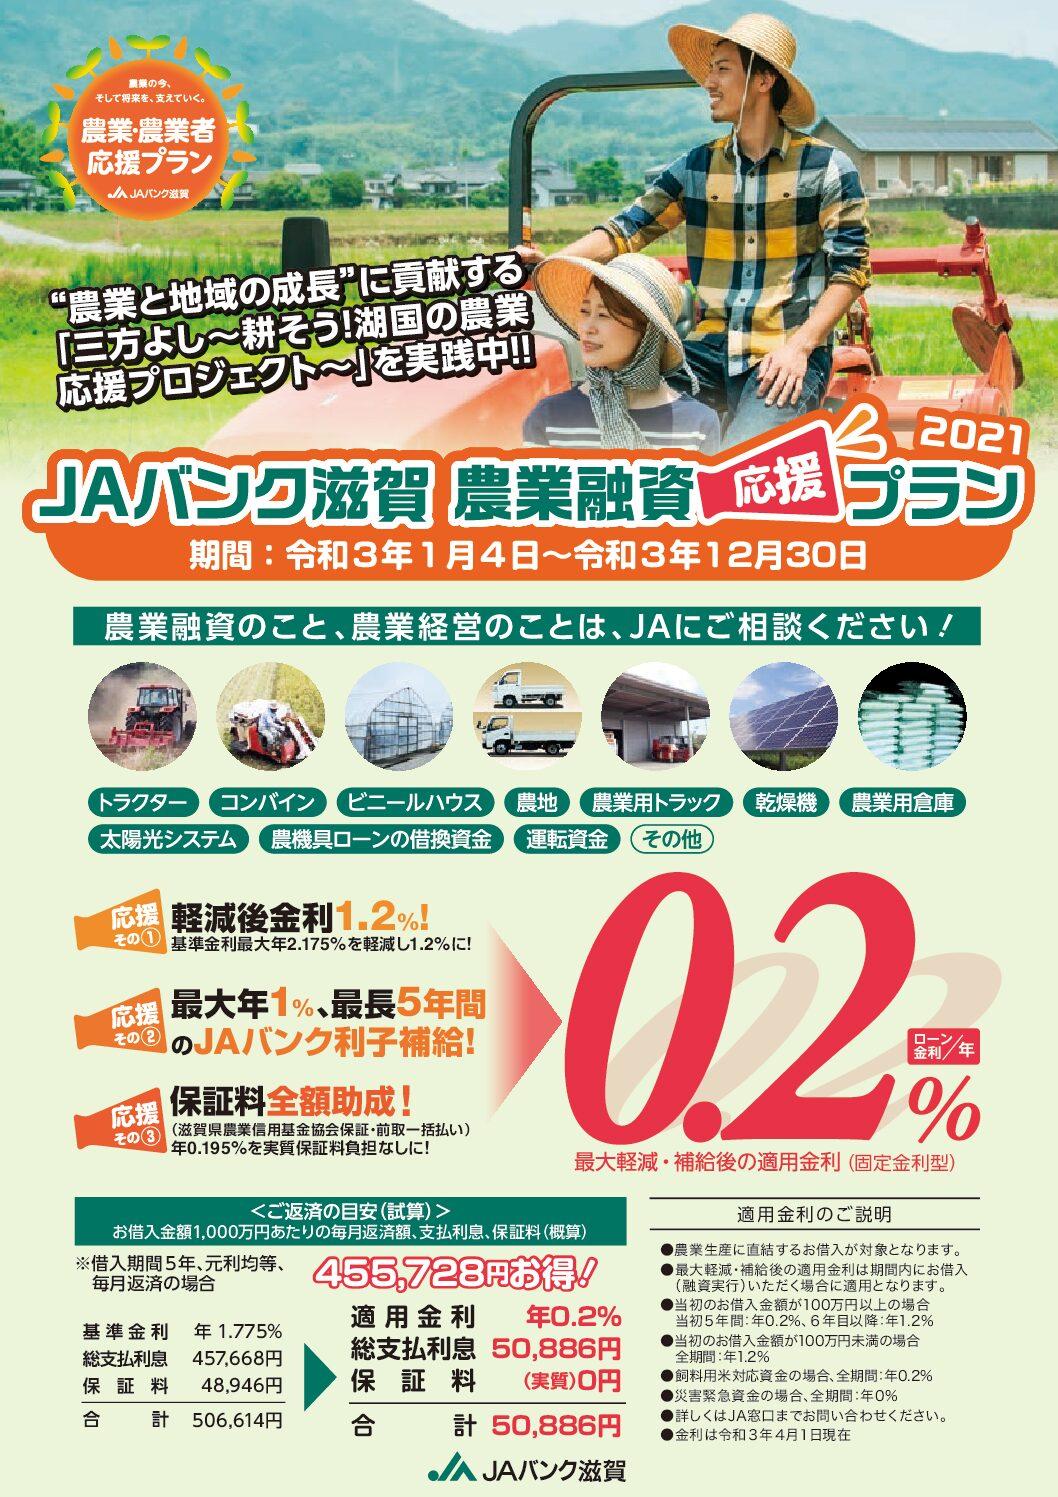 JAバンク滋賀 農業融資応援プラン2021